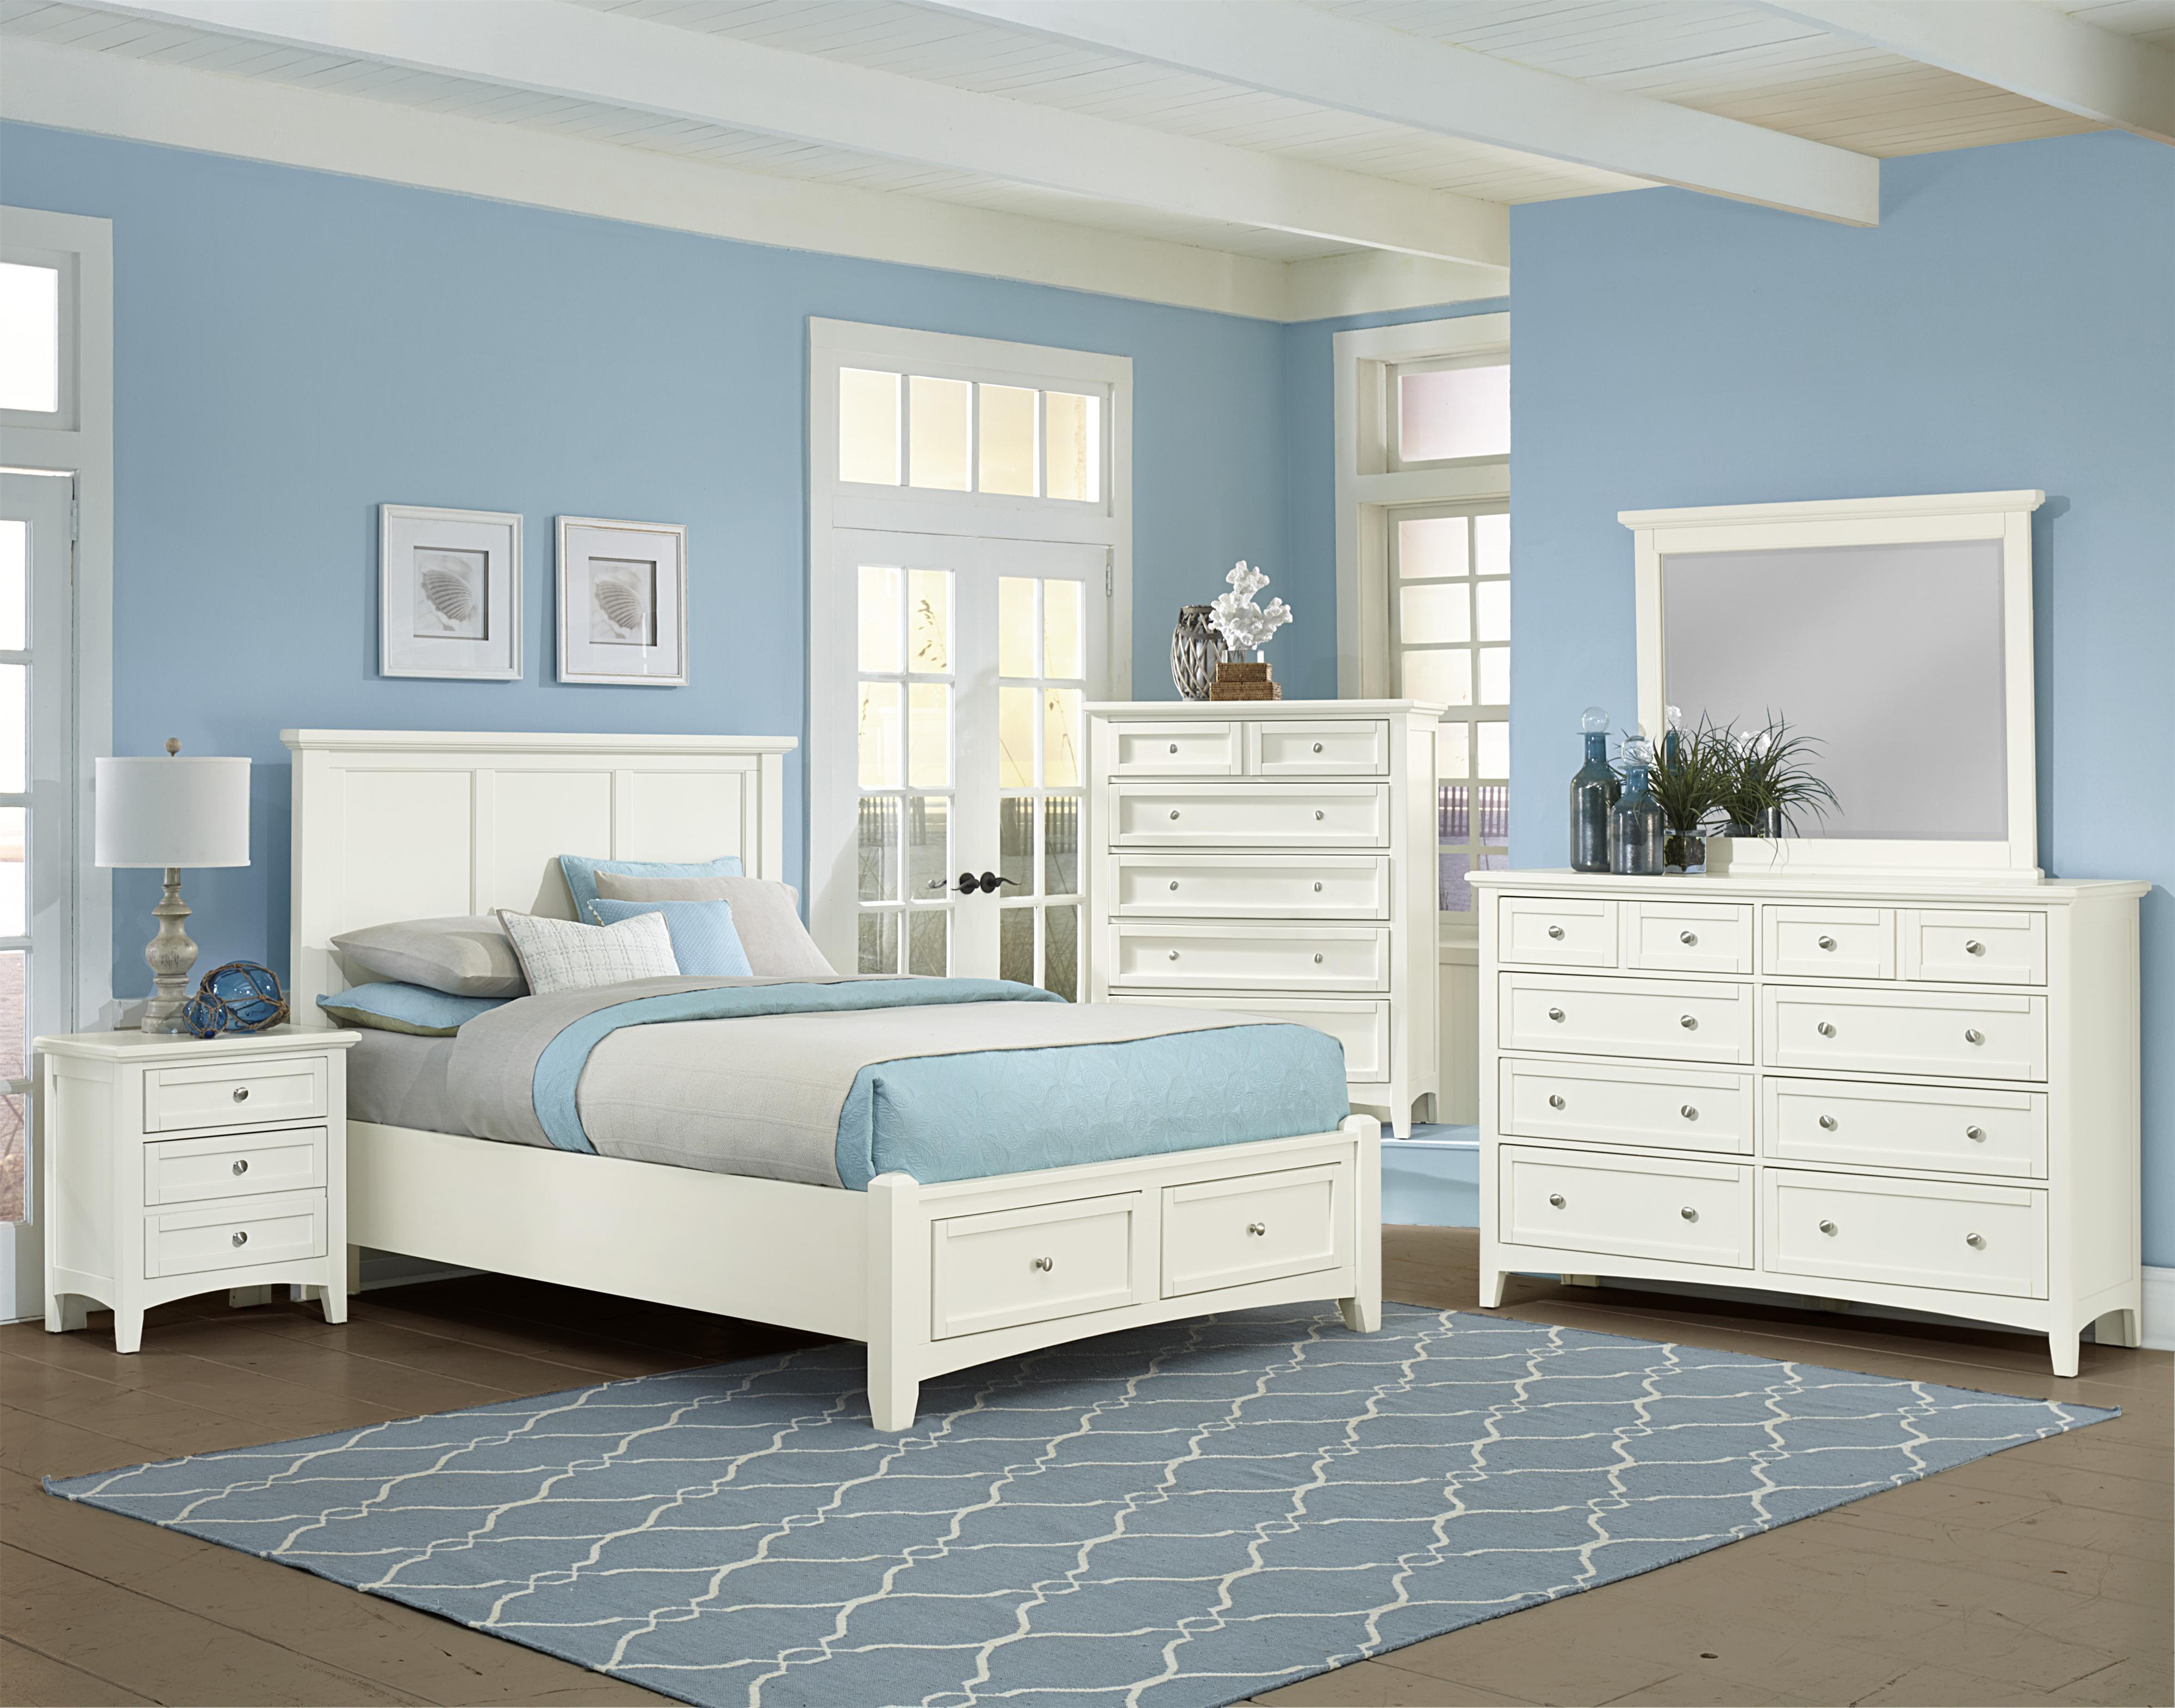 Vaughan Bassett Bonanza Queen Mansion Storage Bed with 2 Drawers ...